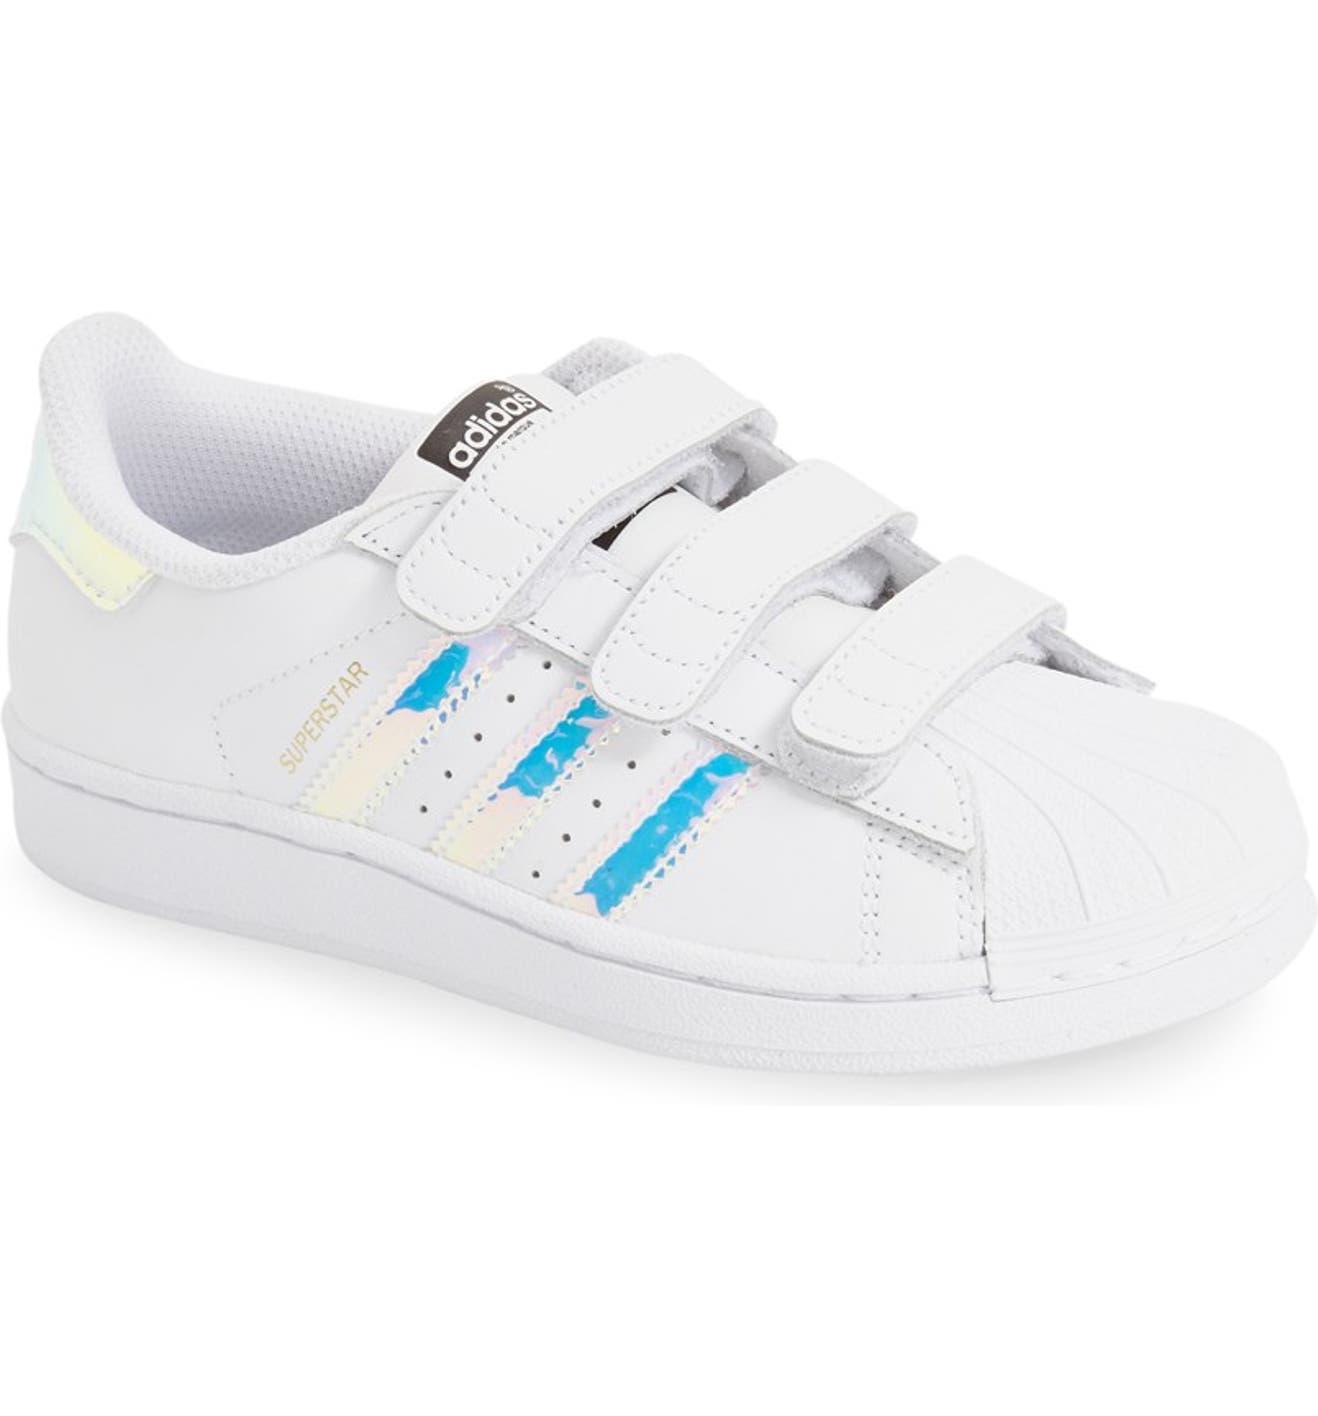 adidas Superstar - Iridescent Sneaker (Baby, Walker, Toddler & Little Kid) | Nordstrom